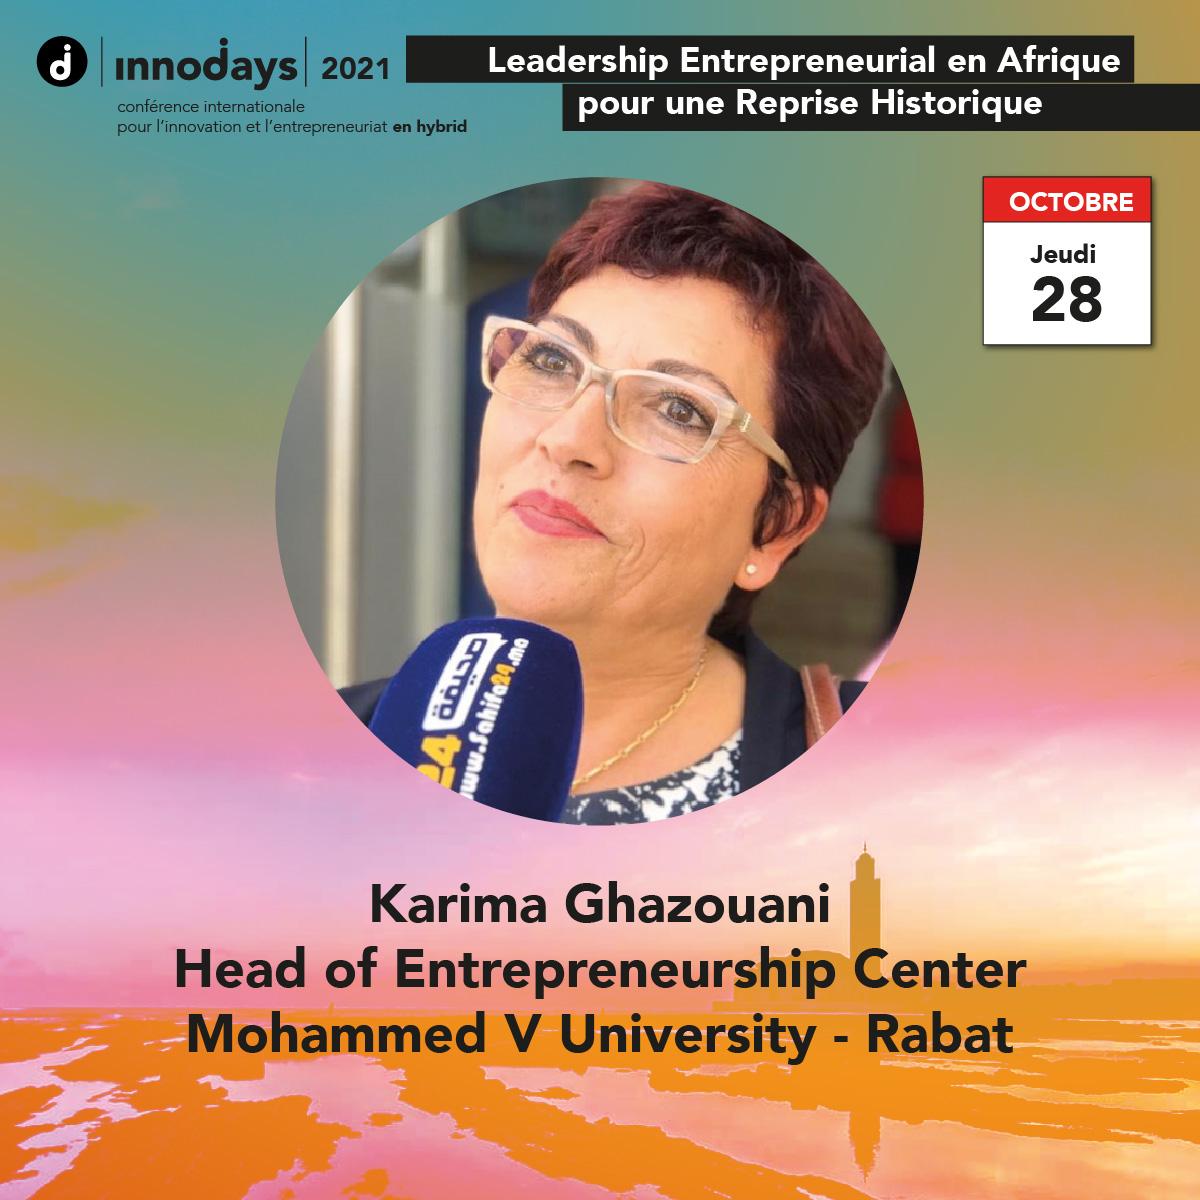 Karima Ghazouani - Directrice du Centre de l'Entrepreneuriat - Université Mohammed V - Maroc